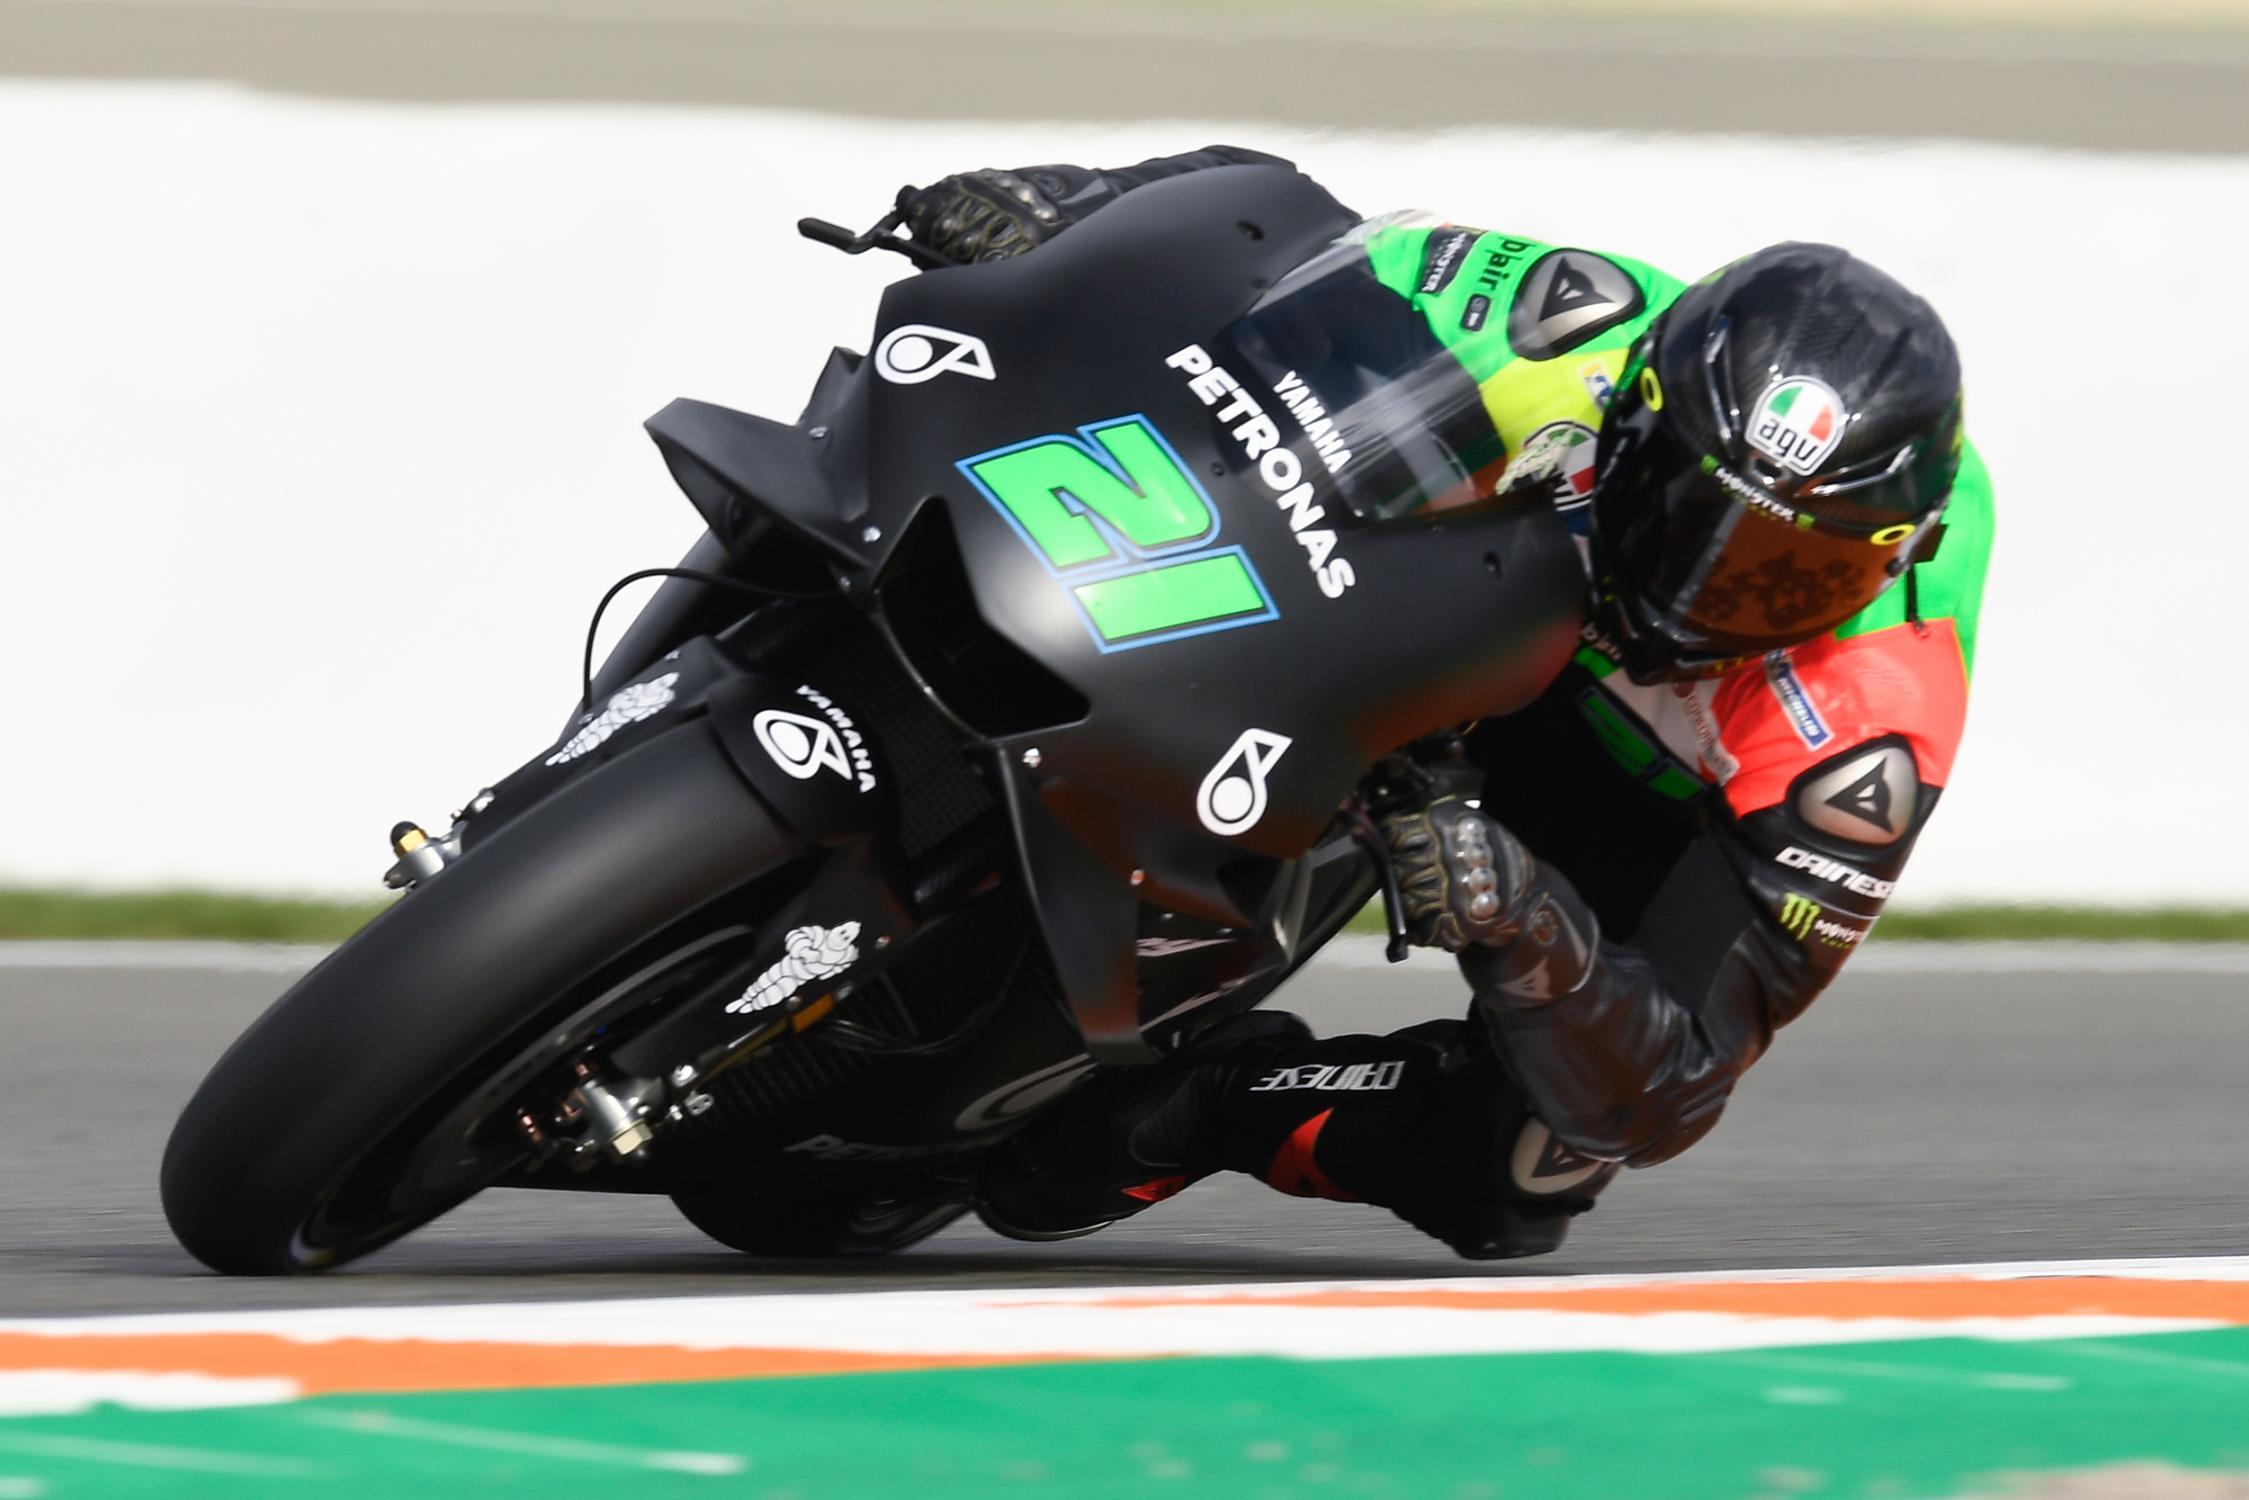 MOTO GP 2019 COMPÉTITIONS Franco-morbidelli-valencia-test-motogp-2018